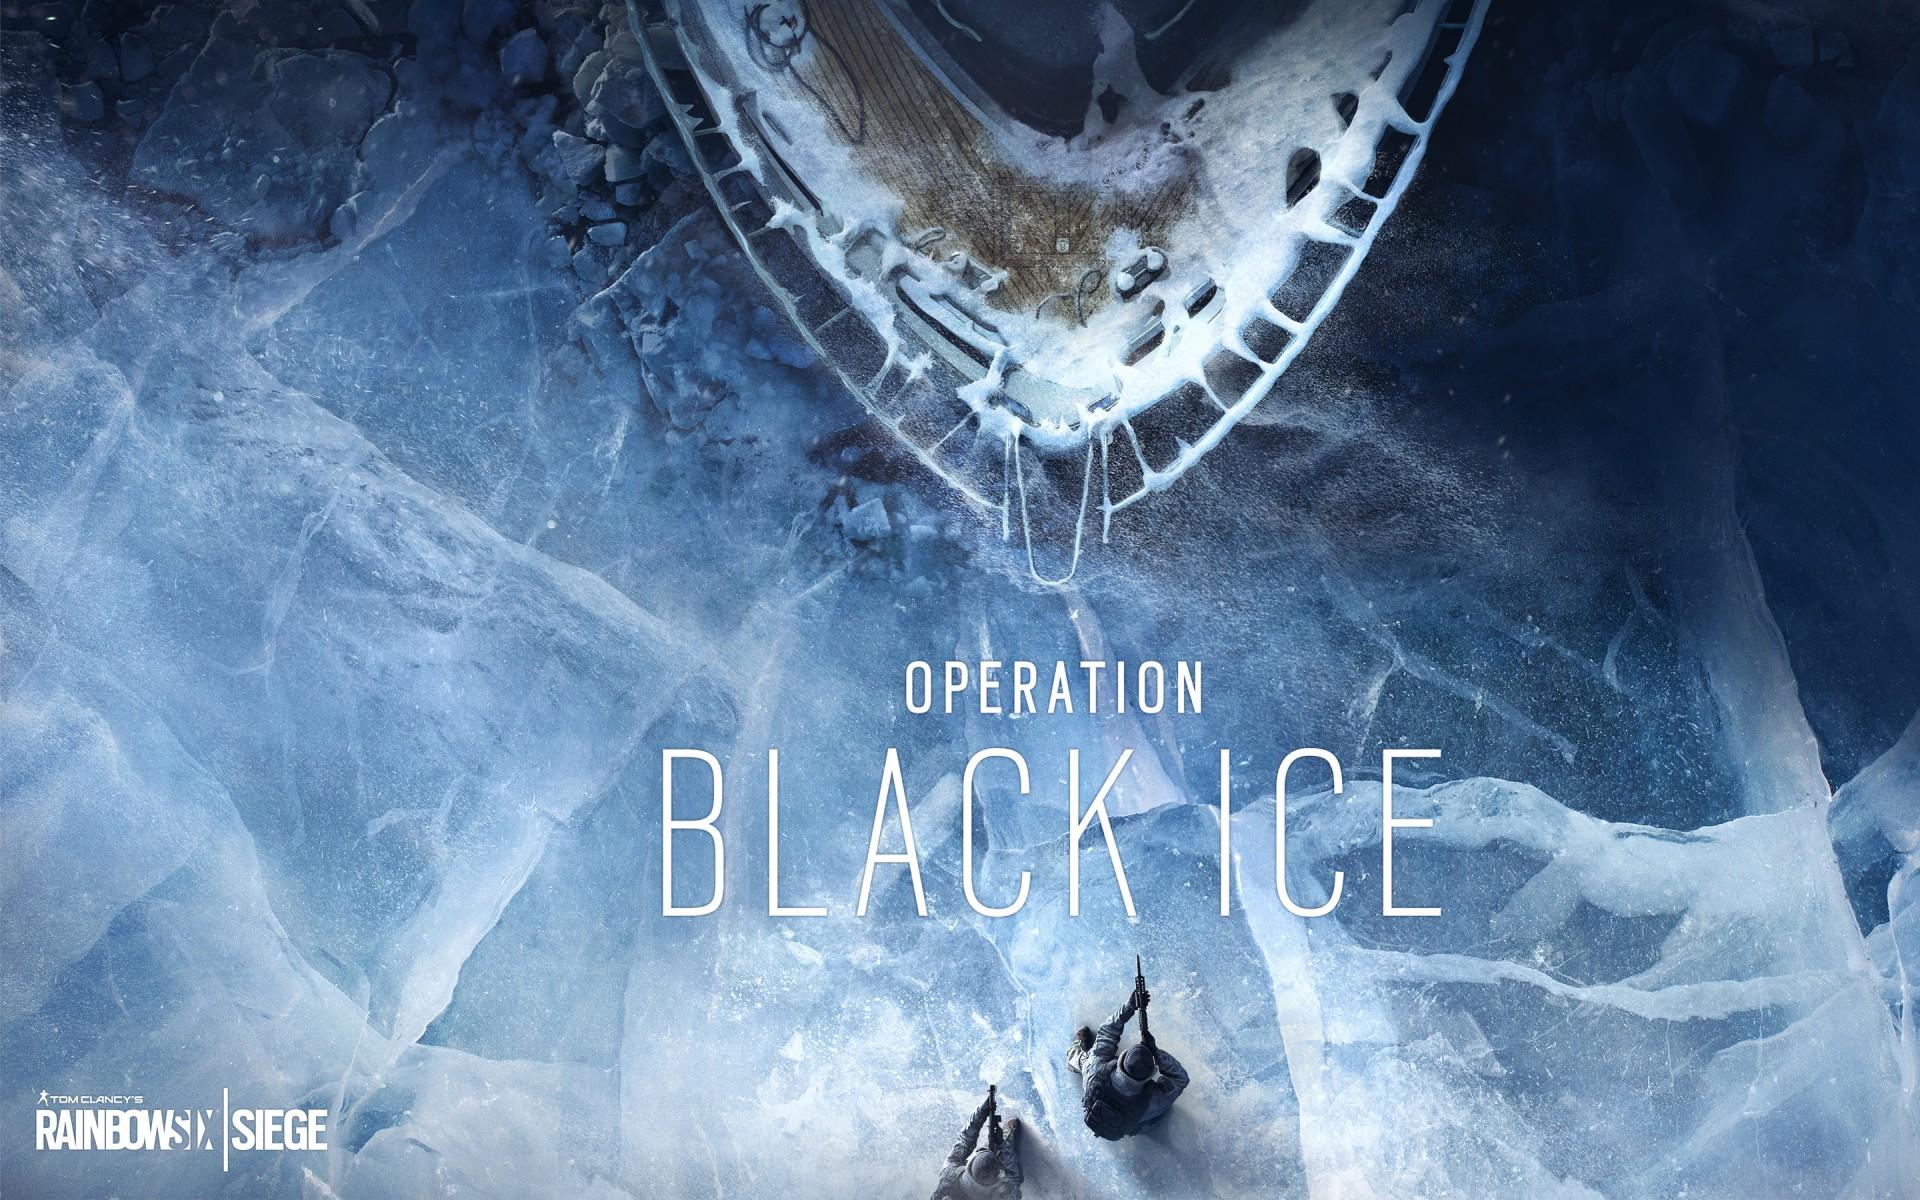 Final Fantasy X Wallpaper Iphone Rainbow Six Siege Operation Black Ice Wallpapers Hd